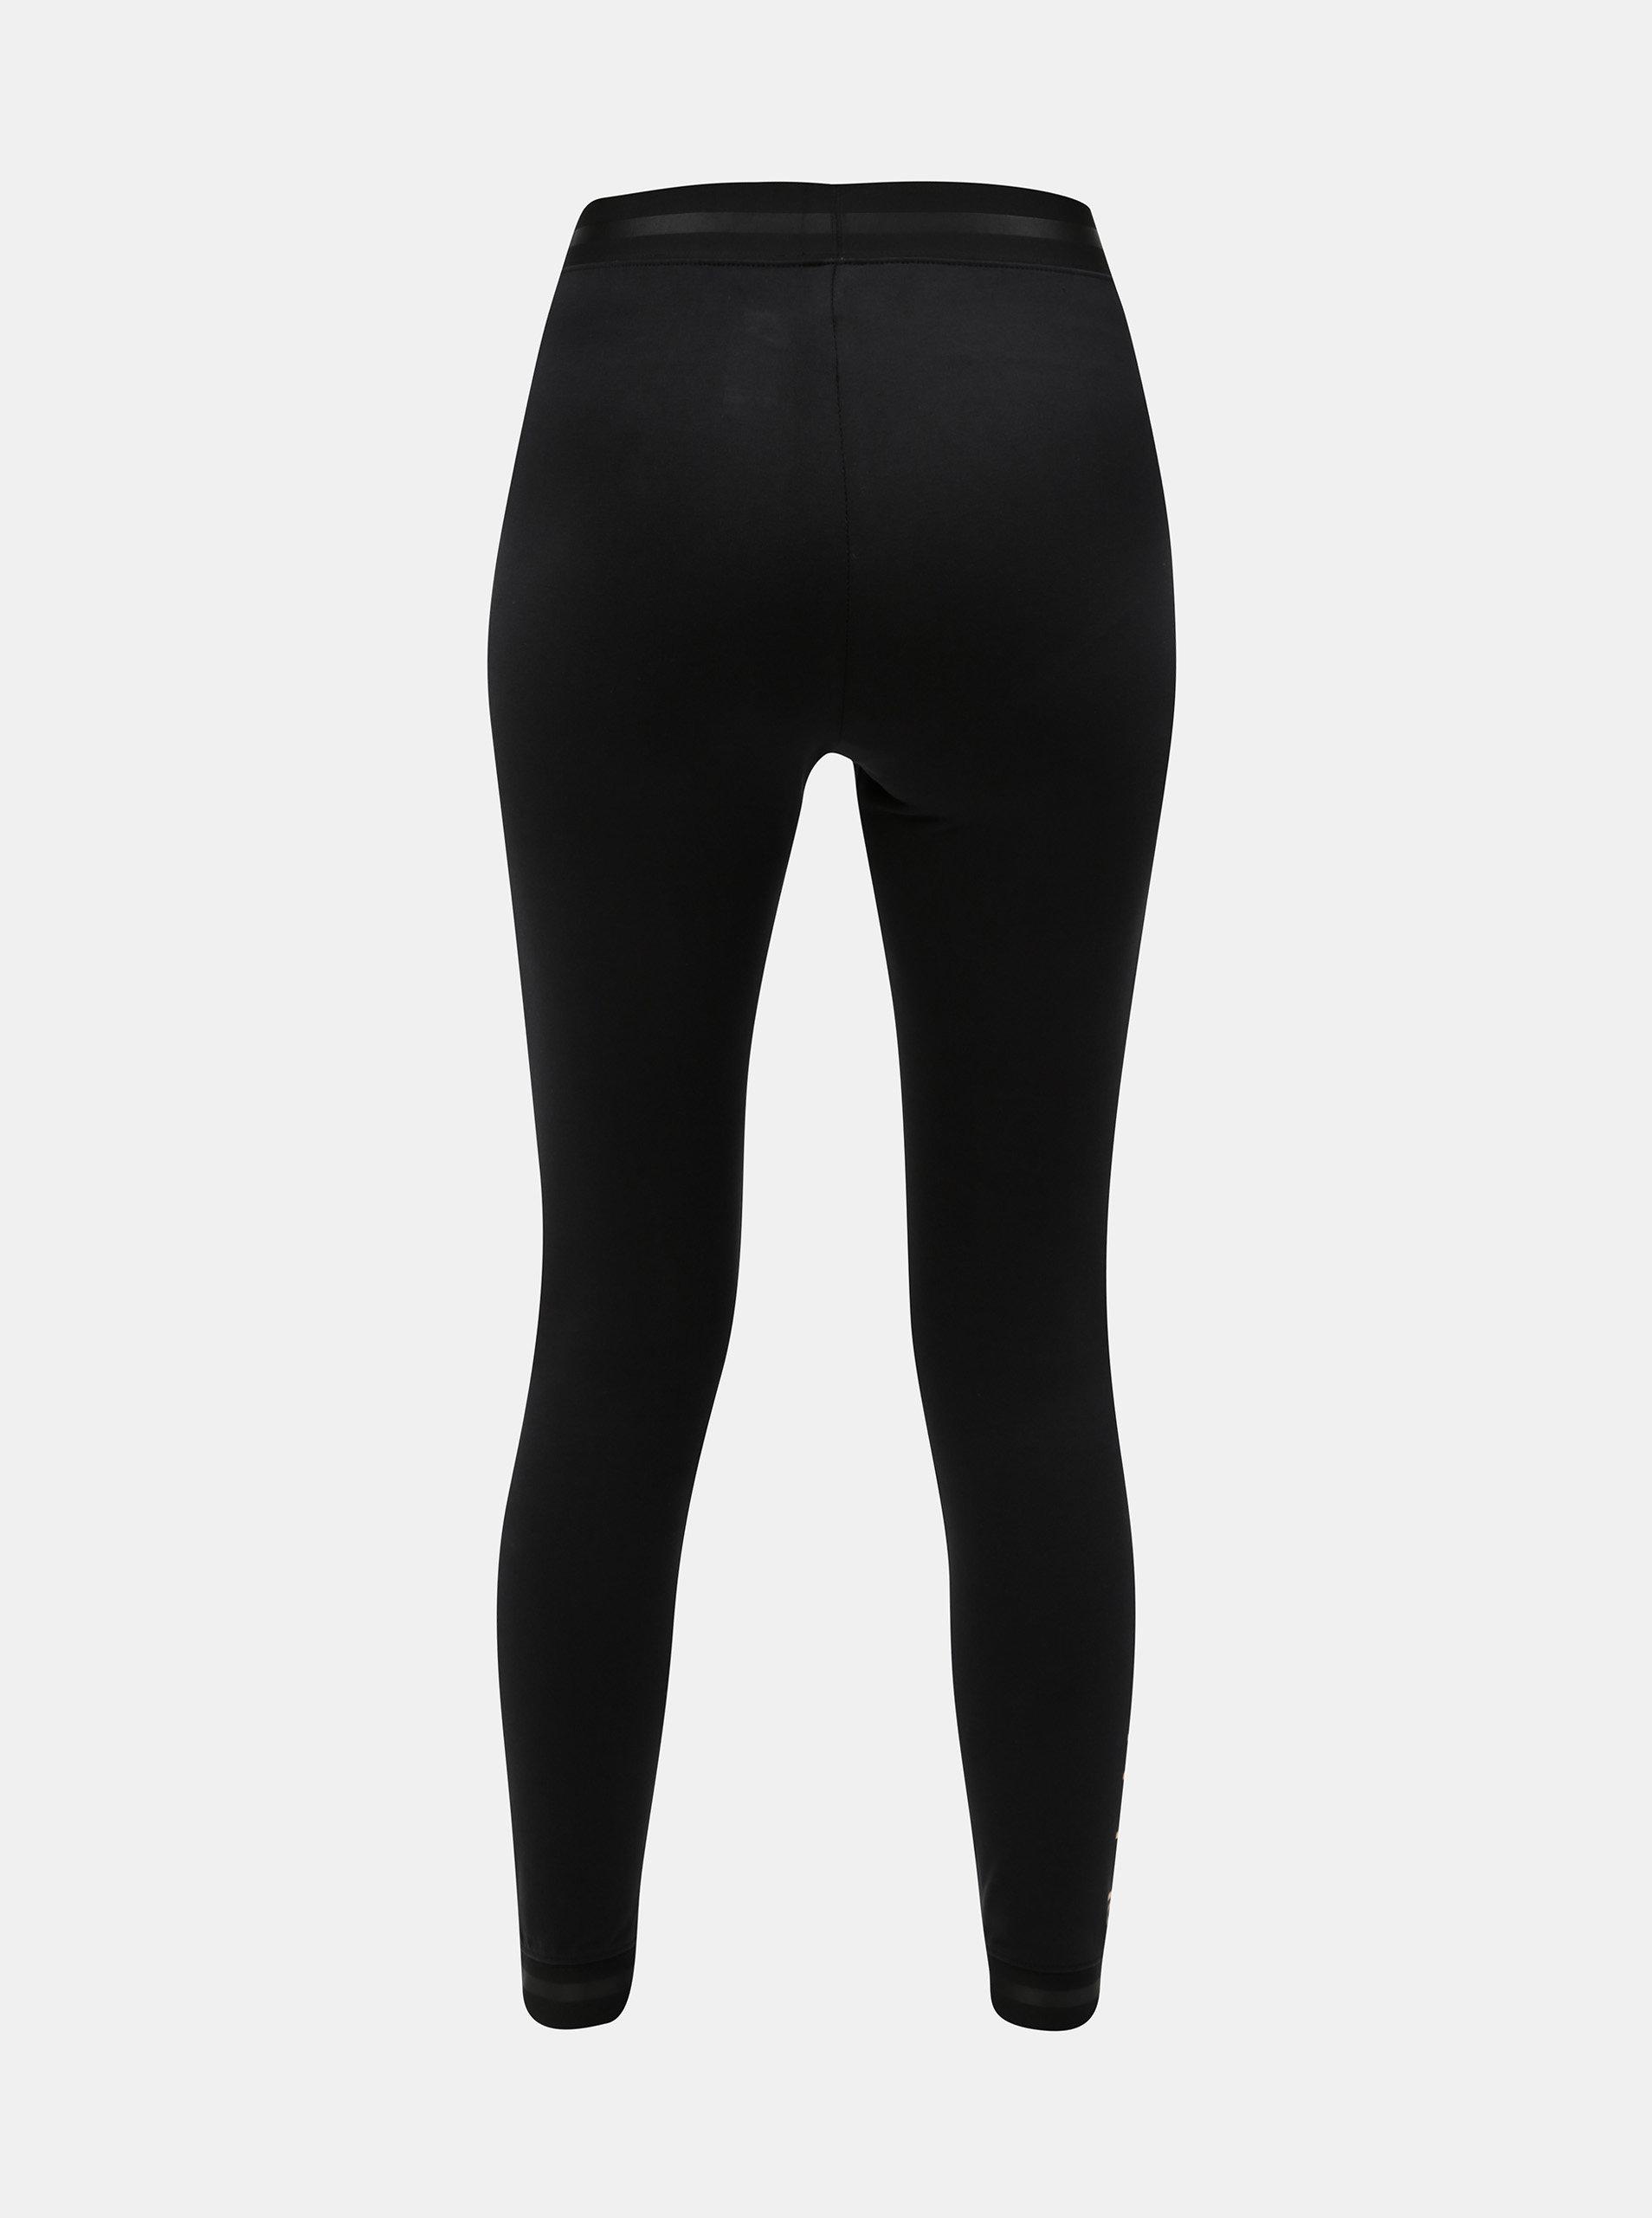 Černé dámské legíny s potiskem Nike Air ... c824b326de